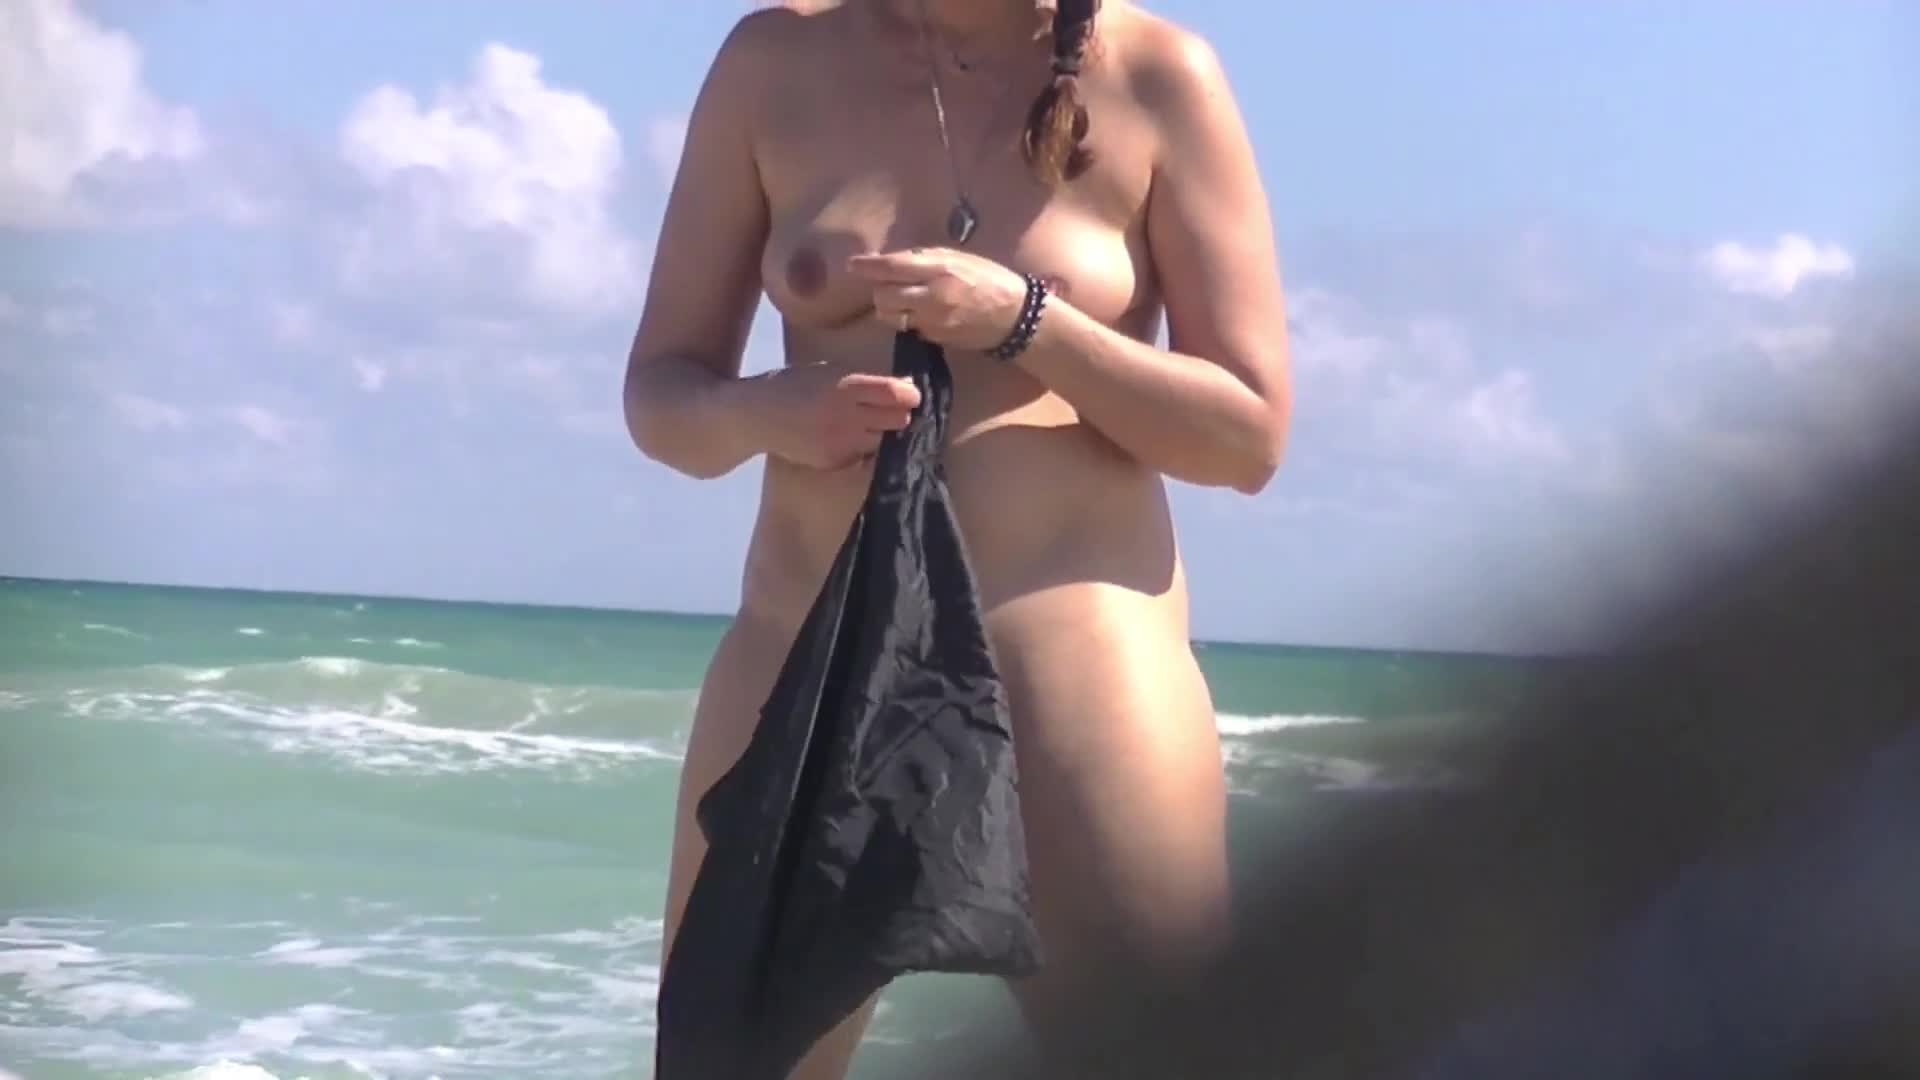 Wild hardcore roaring nudes